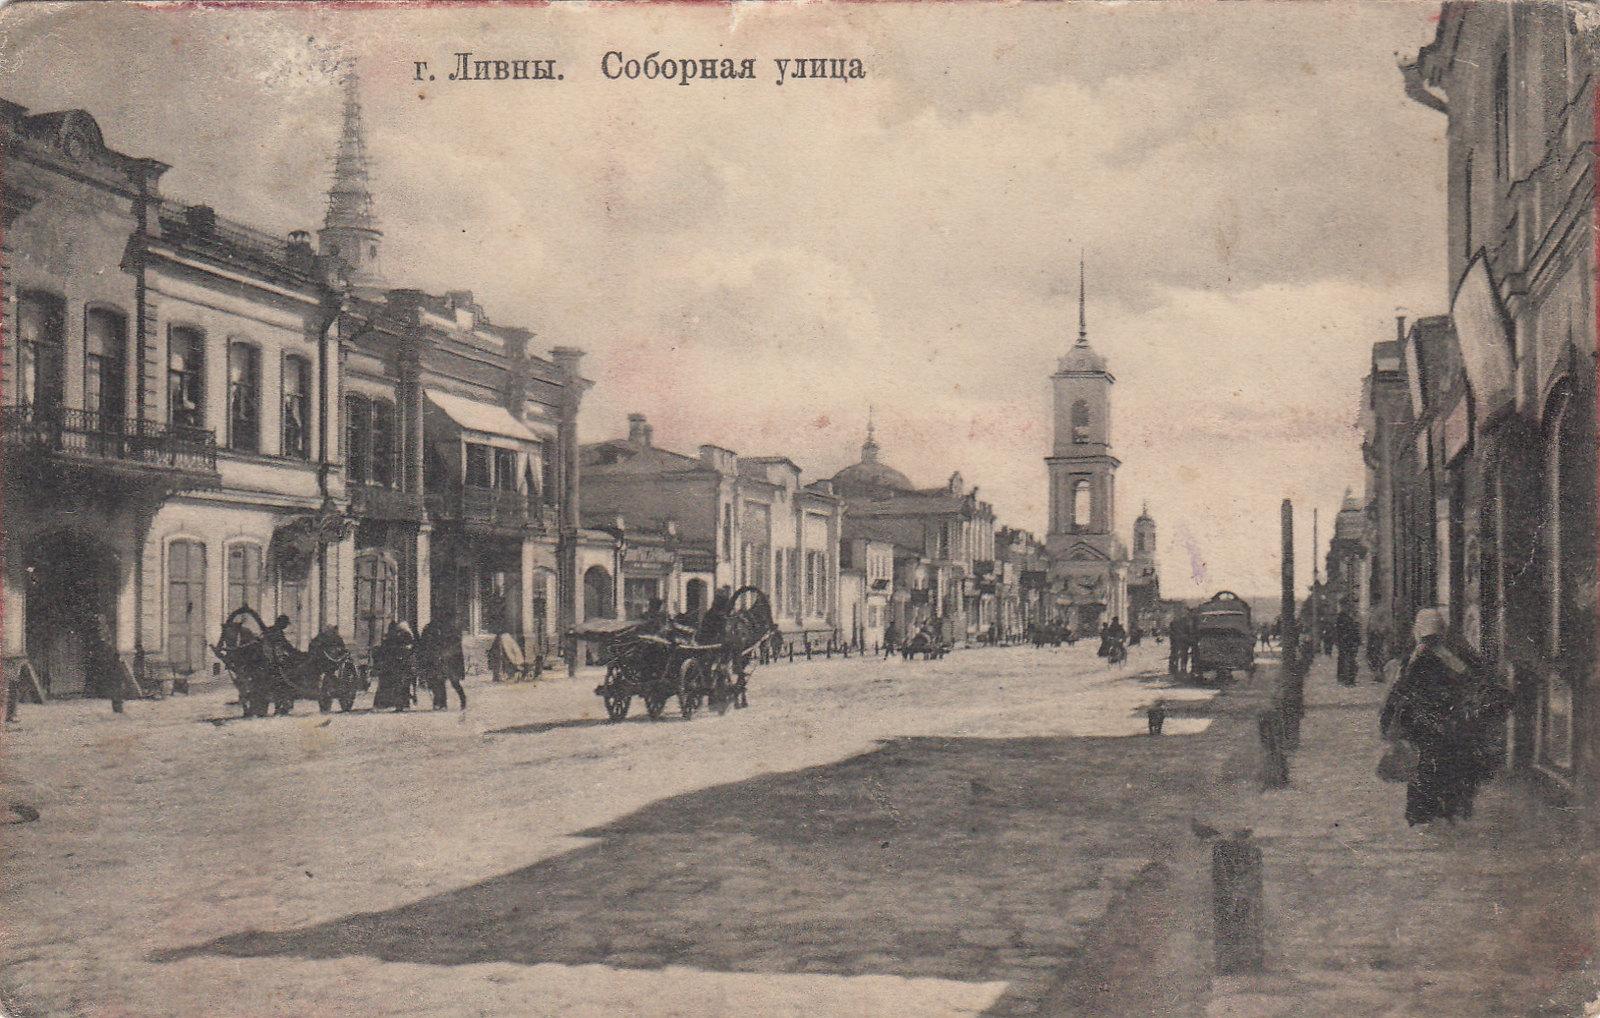 Соборная улица (2)